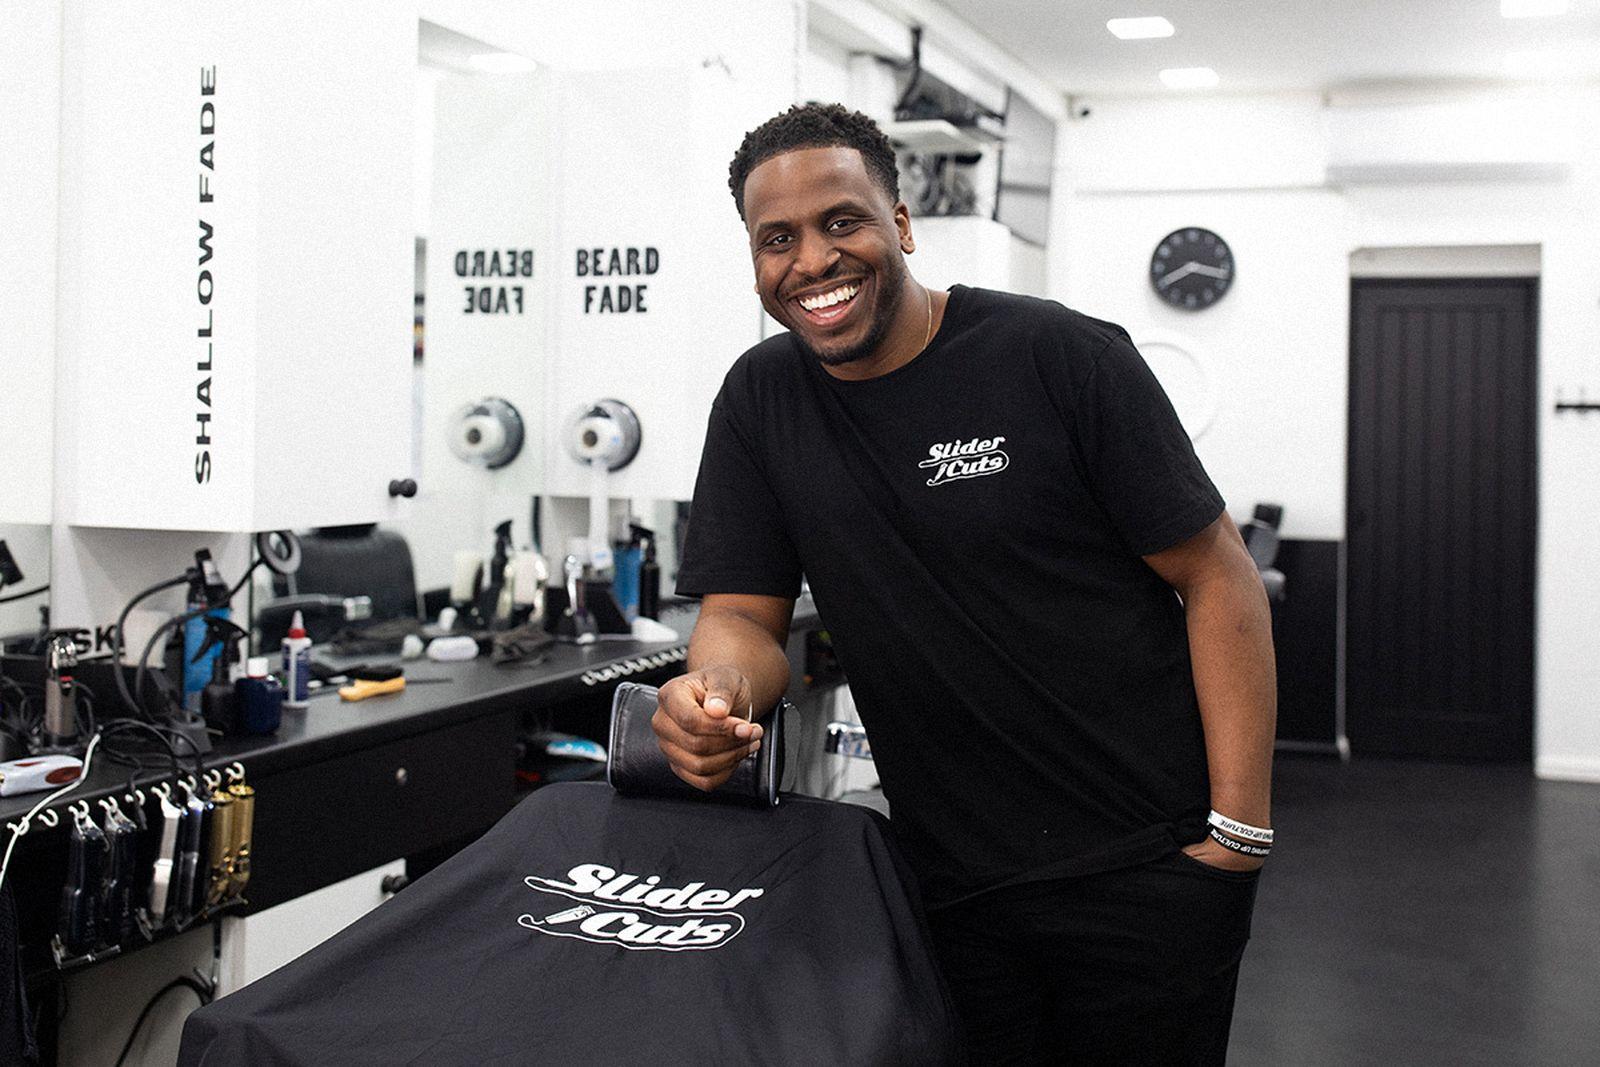 slidercuts-barber-interview-01